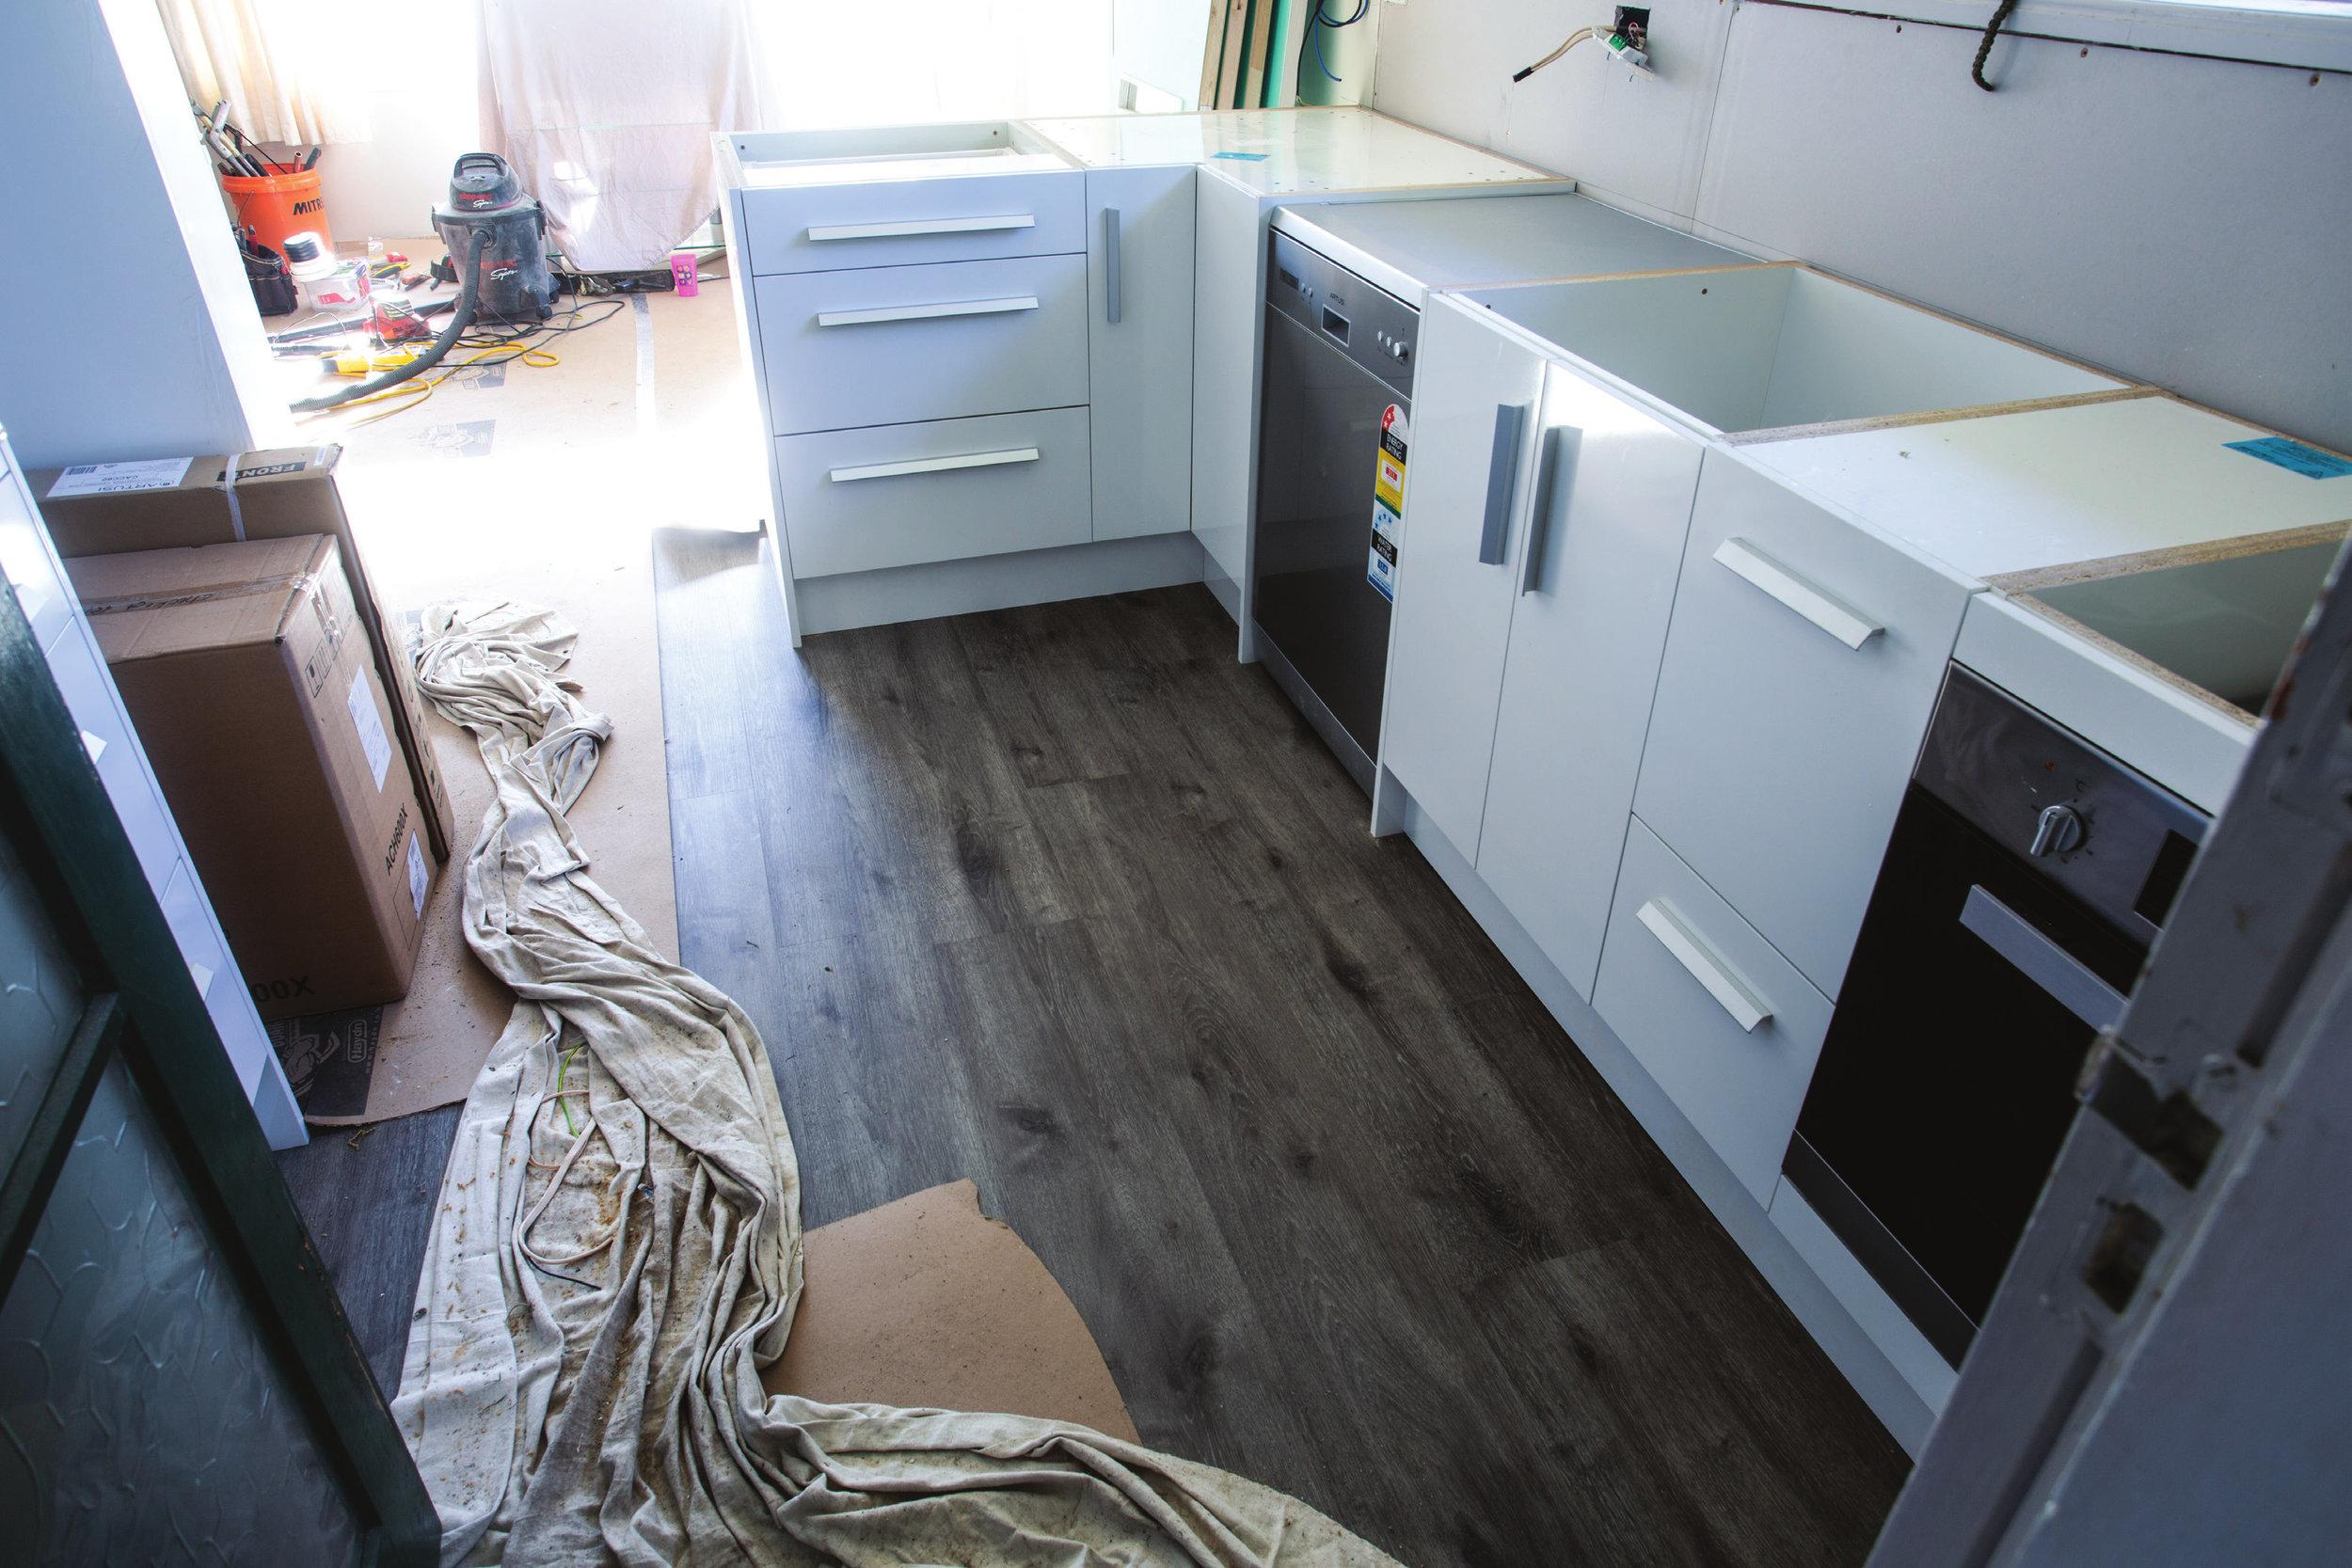 Shed_079_20180611_Installing-a-Kitchen-030.jpg